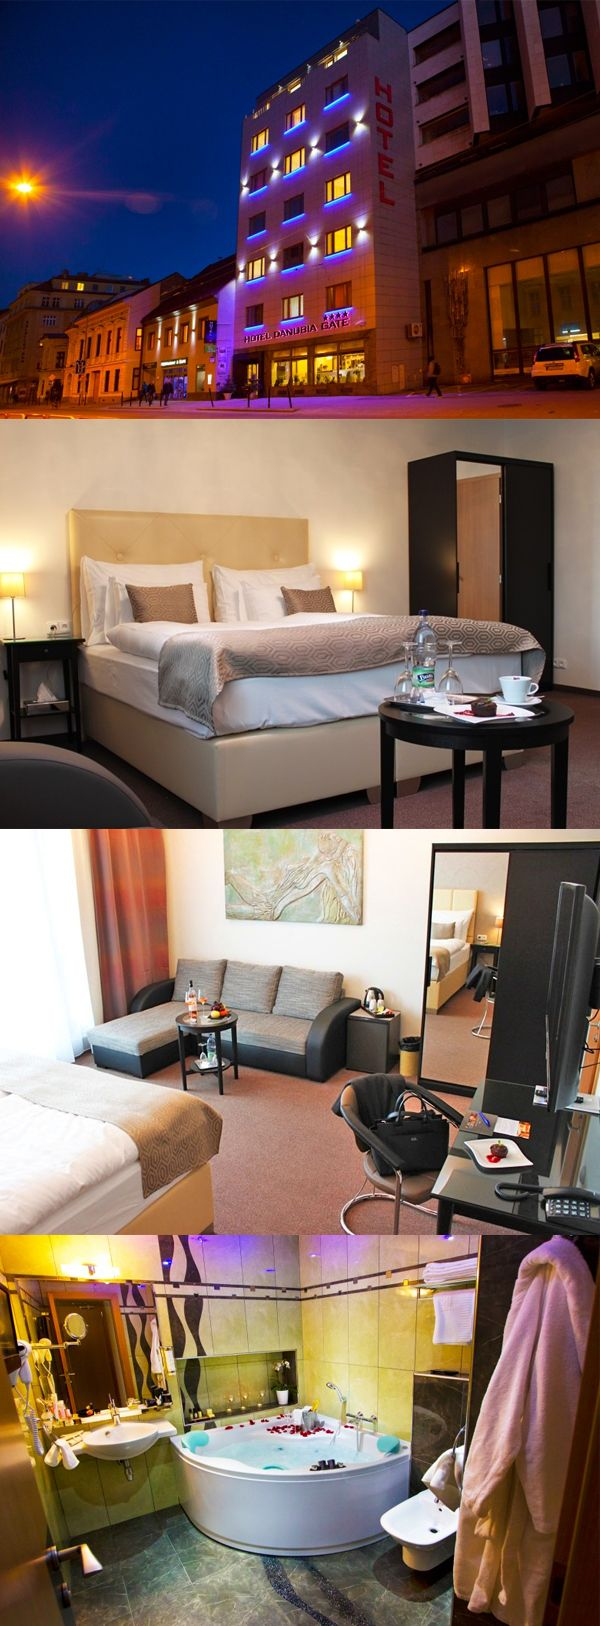 Hotel DANUBIA GATE **** - Pozsony, Kis-Kárpátok térsége